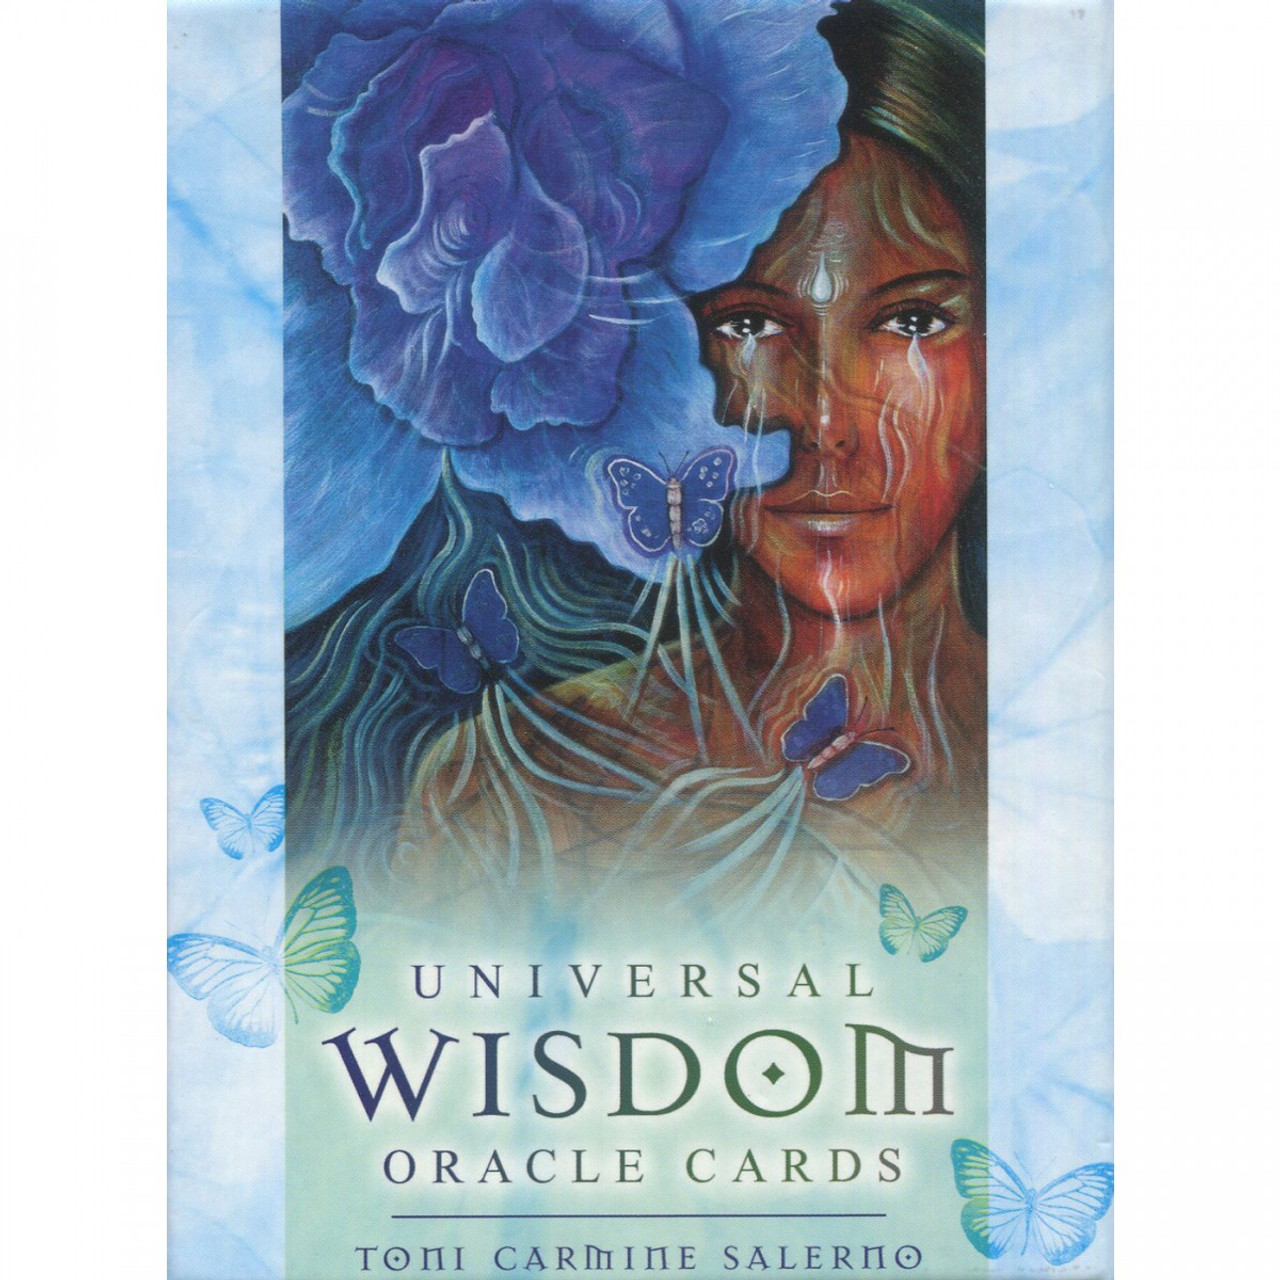 Universal Wisdom Oracle Cards by Toni Carmine Salerno